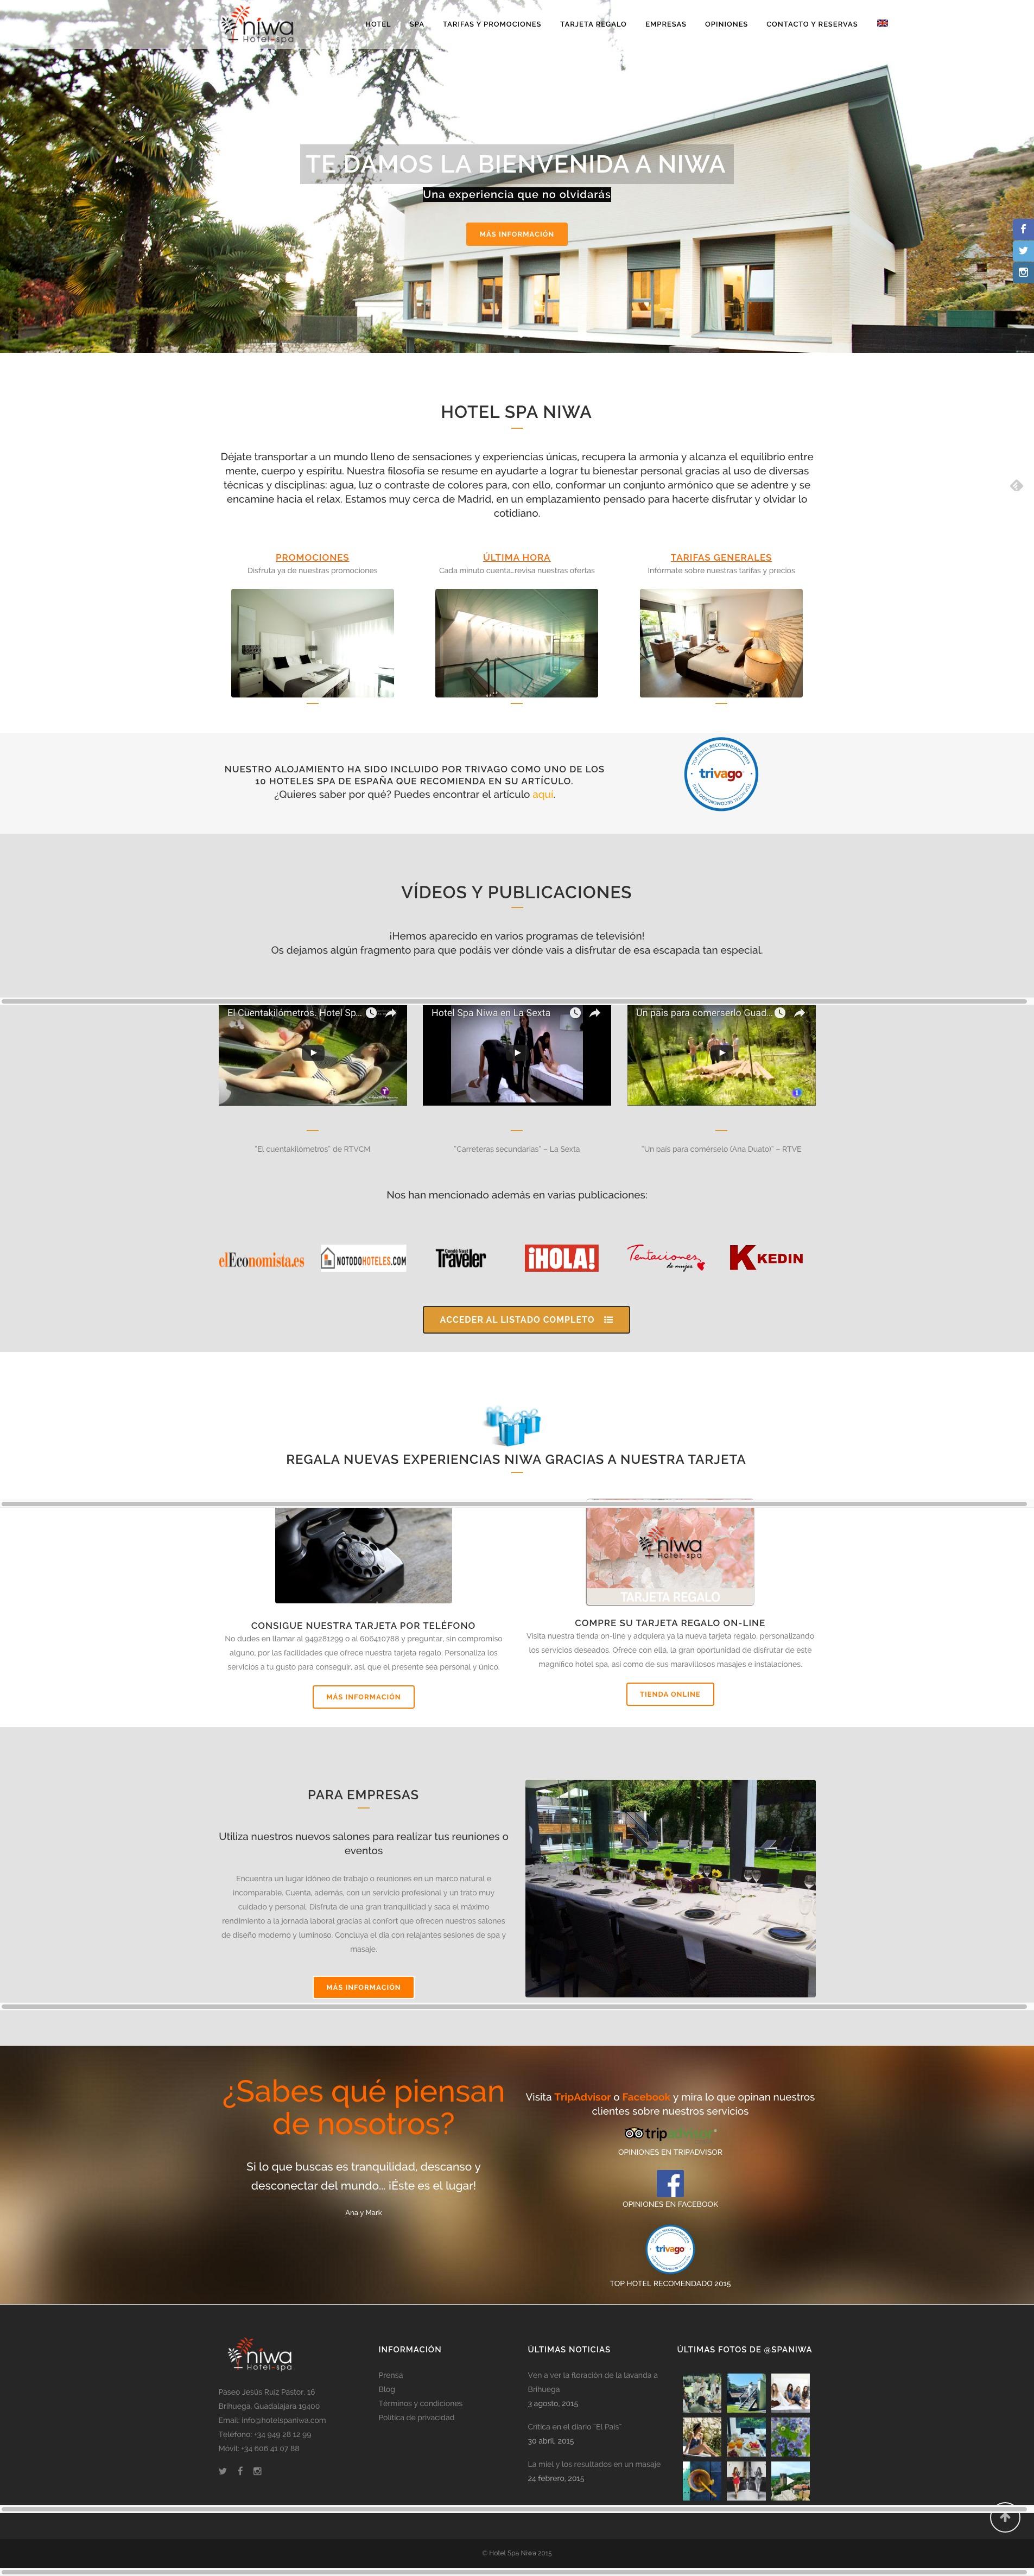 Captura de pantalla de la web completa de Hotel Spa Niwa